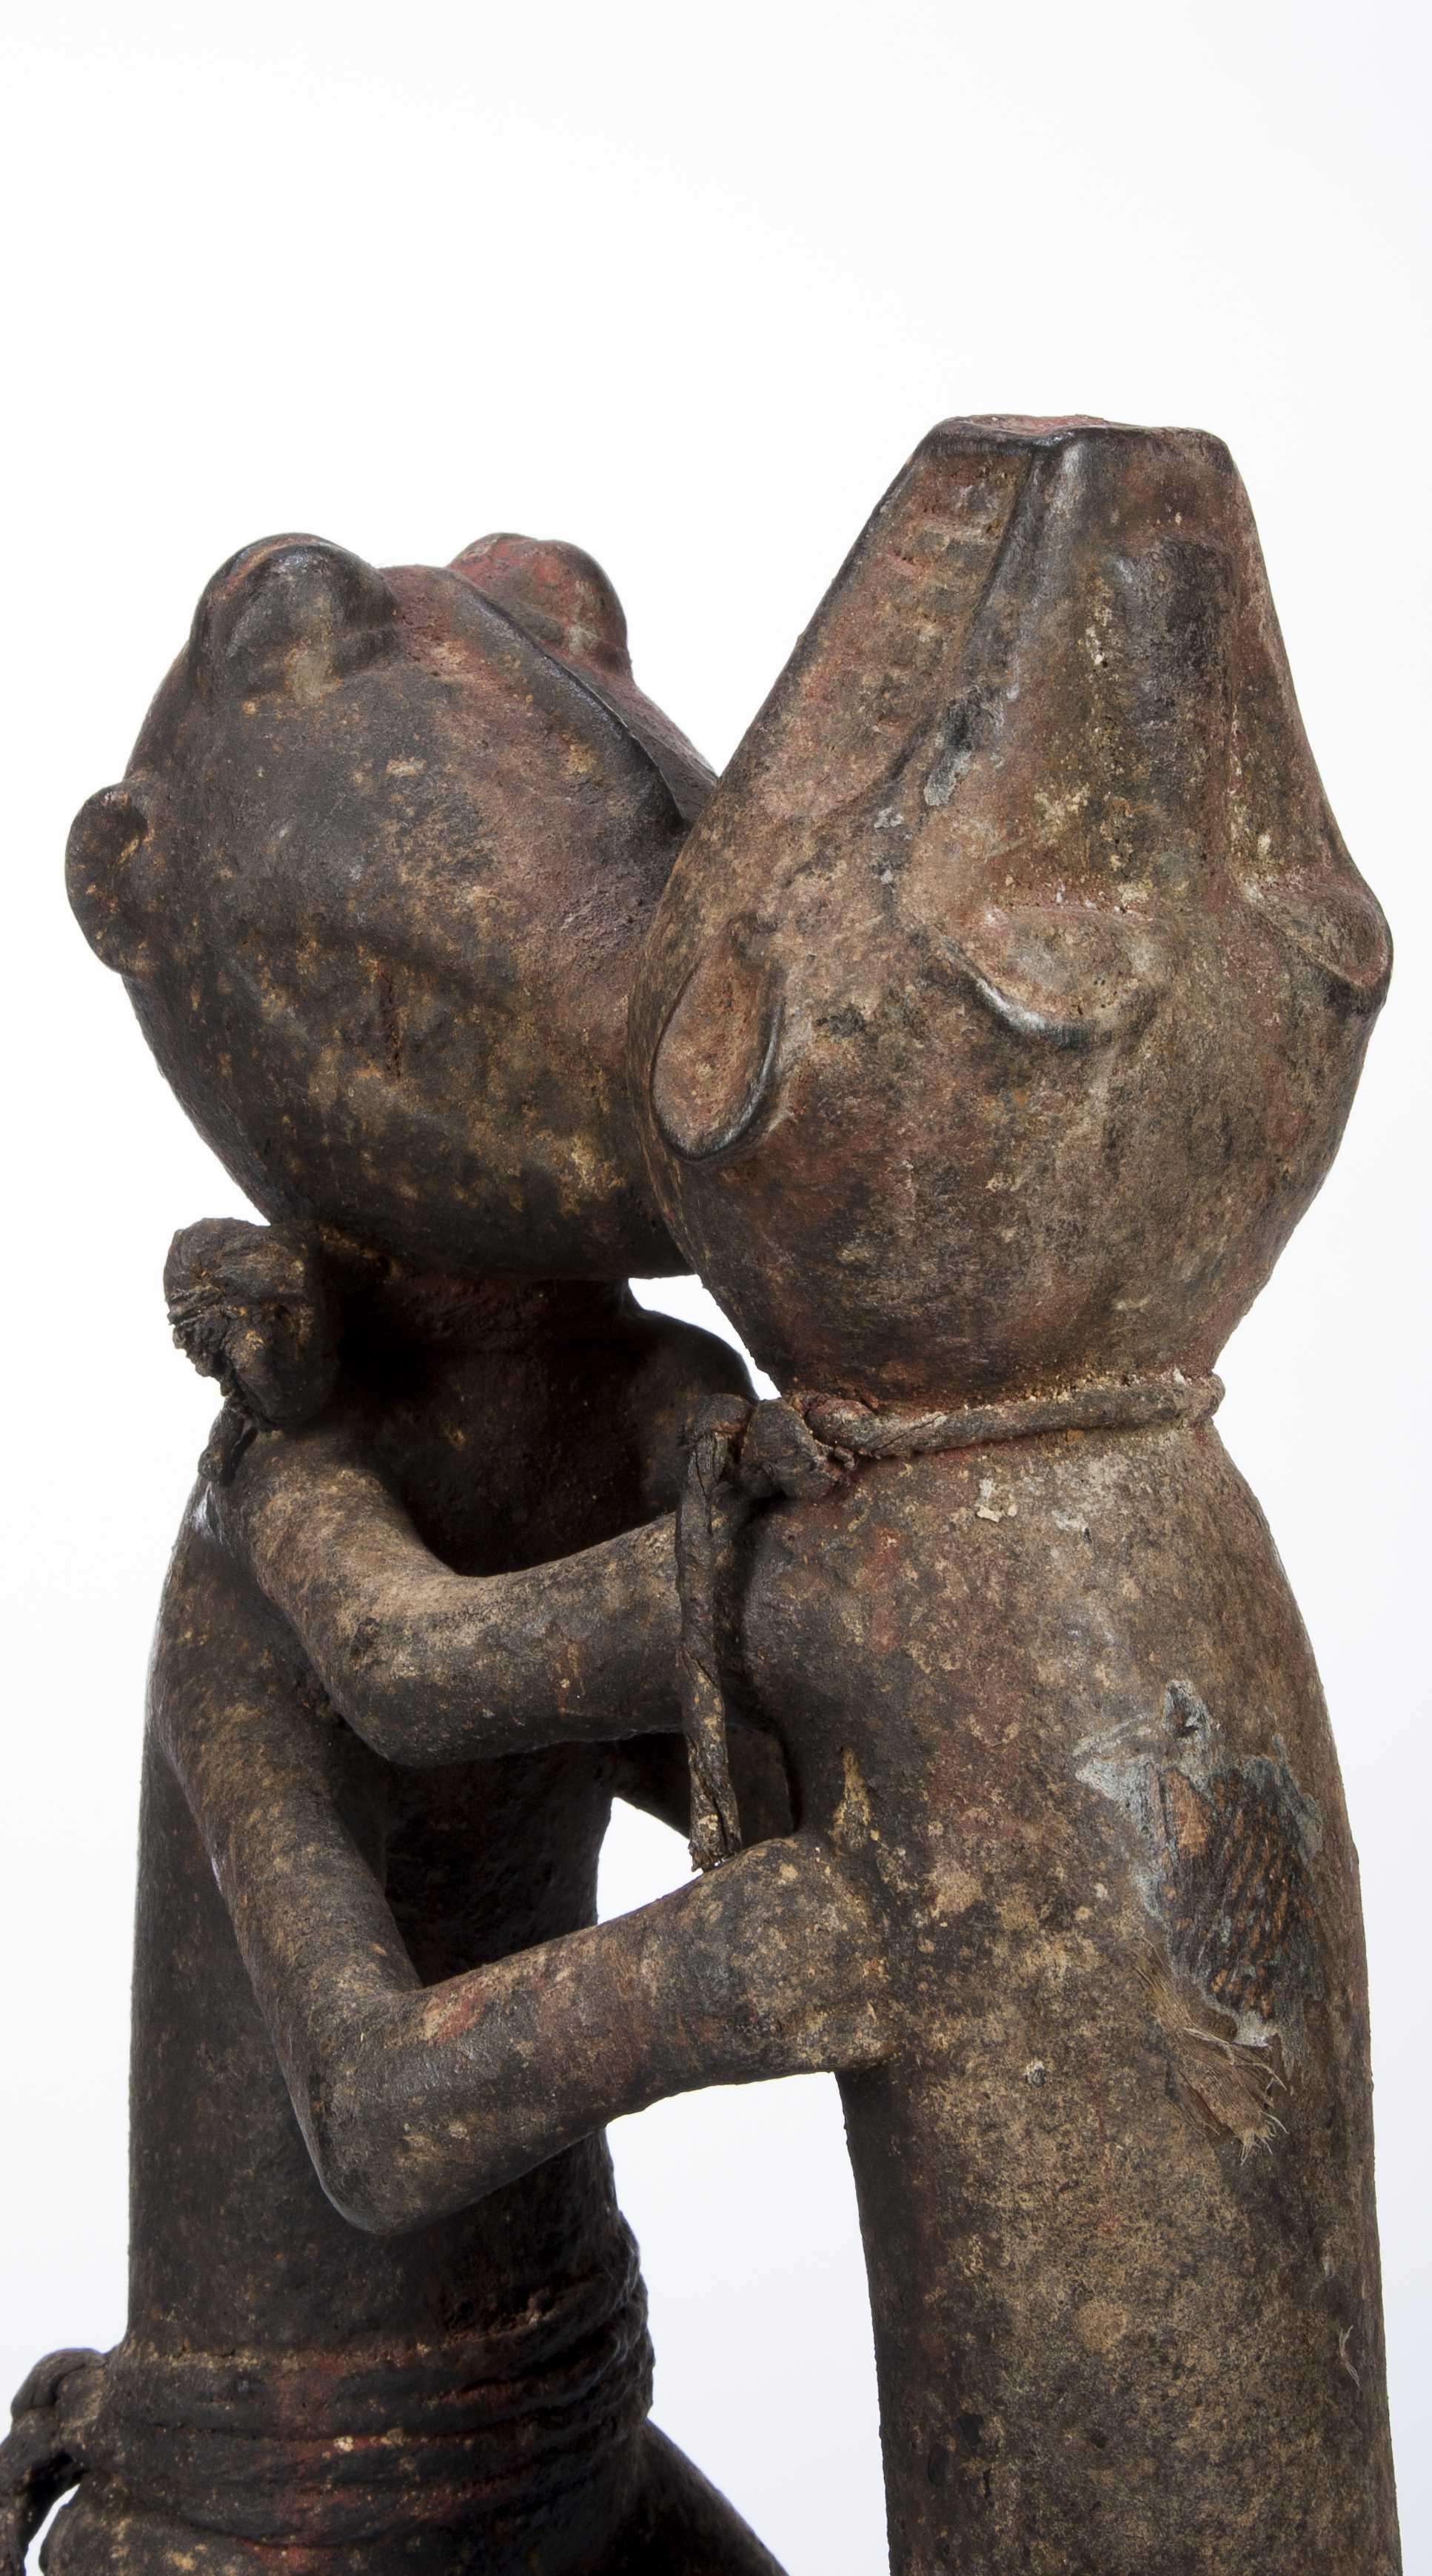 A Baule Shrine Carving Of Fighting Monkeys